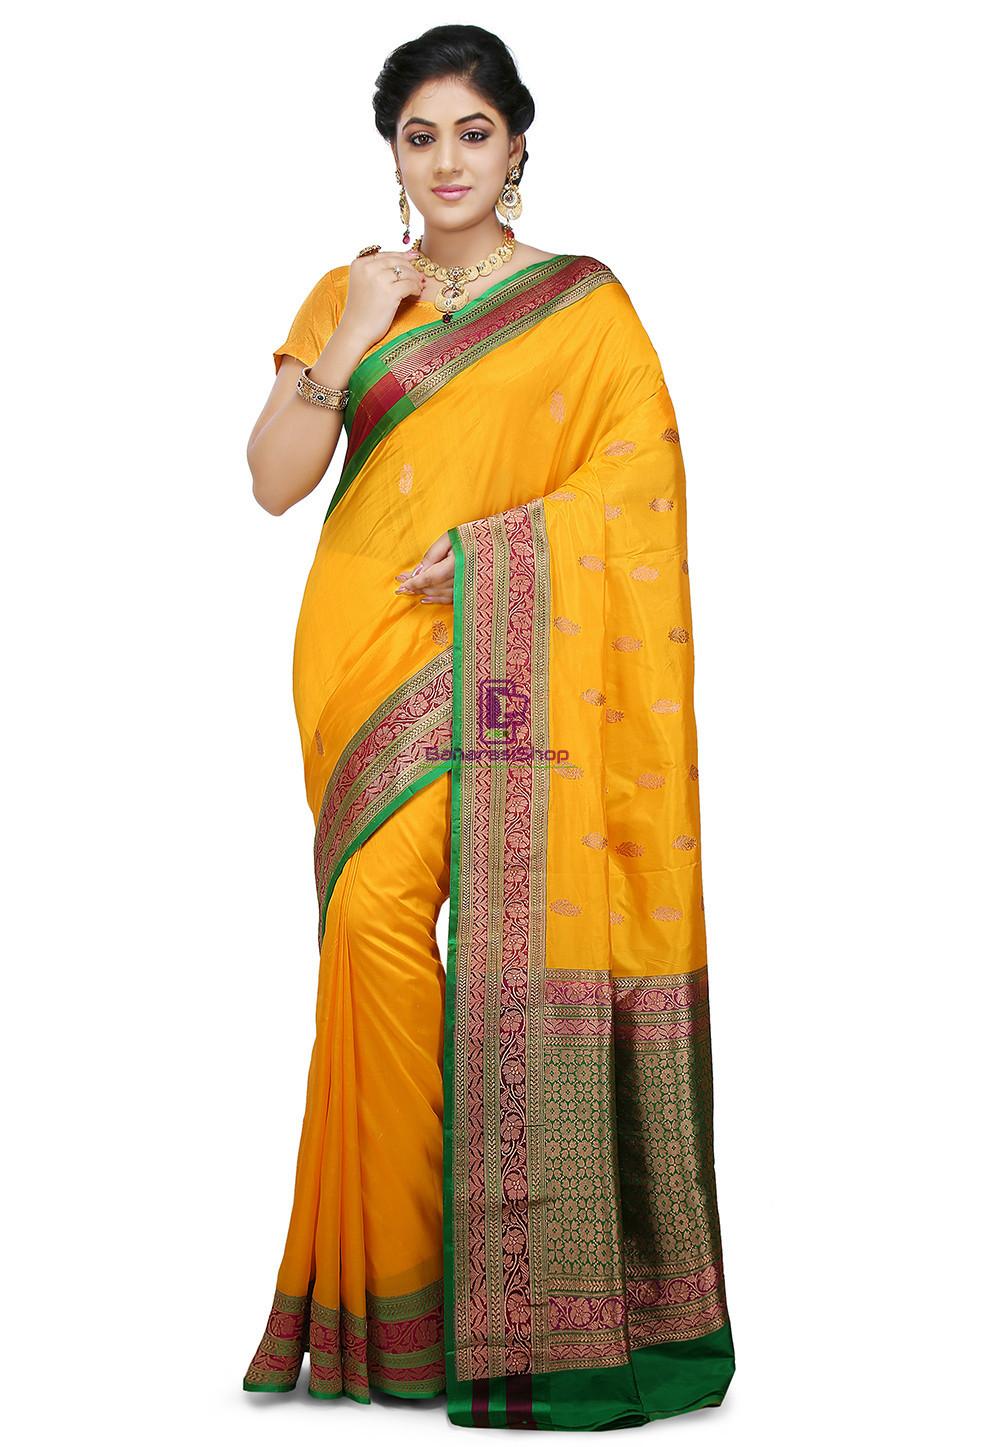 Banarasi Pure Katan Silk Handloom Saree in Yellow 1